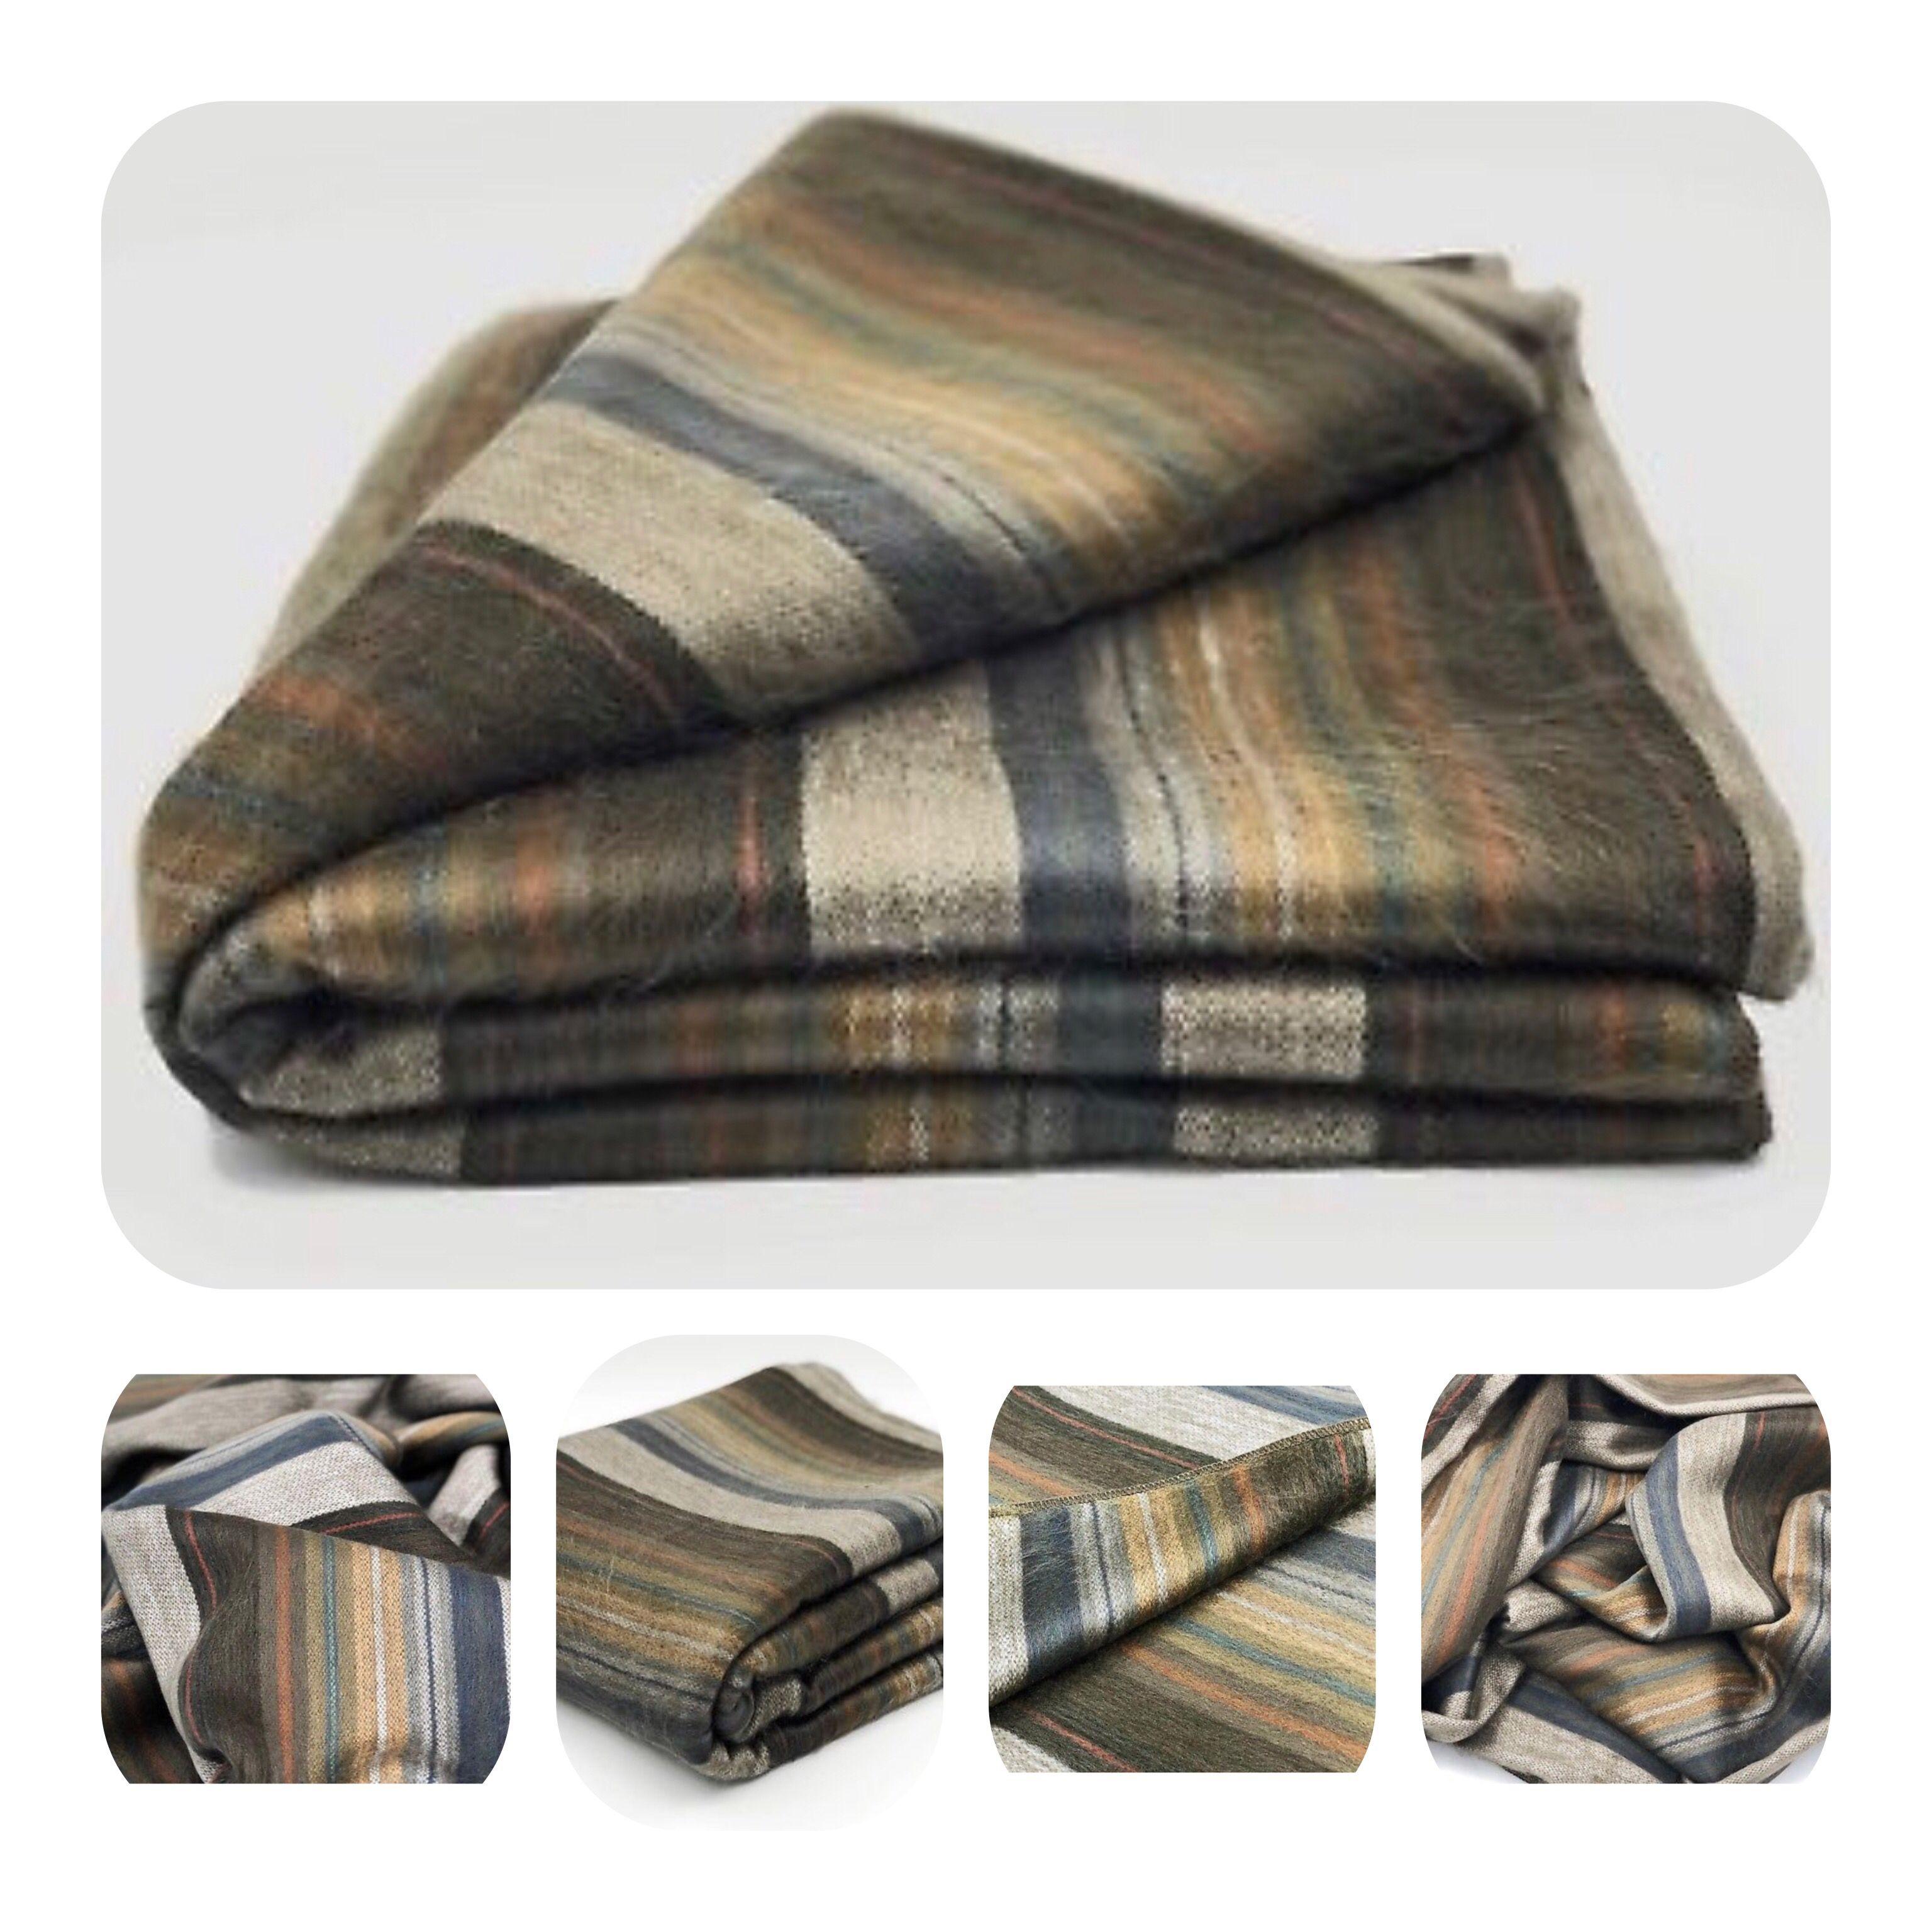 Soft Warm Alpaca Llama Wool Blanket Bed Sofa Couch Cover Queen Throw 90 X65 Wool Blanket Alpaca Wool Blanket Alpaca Blanket